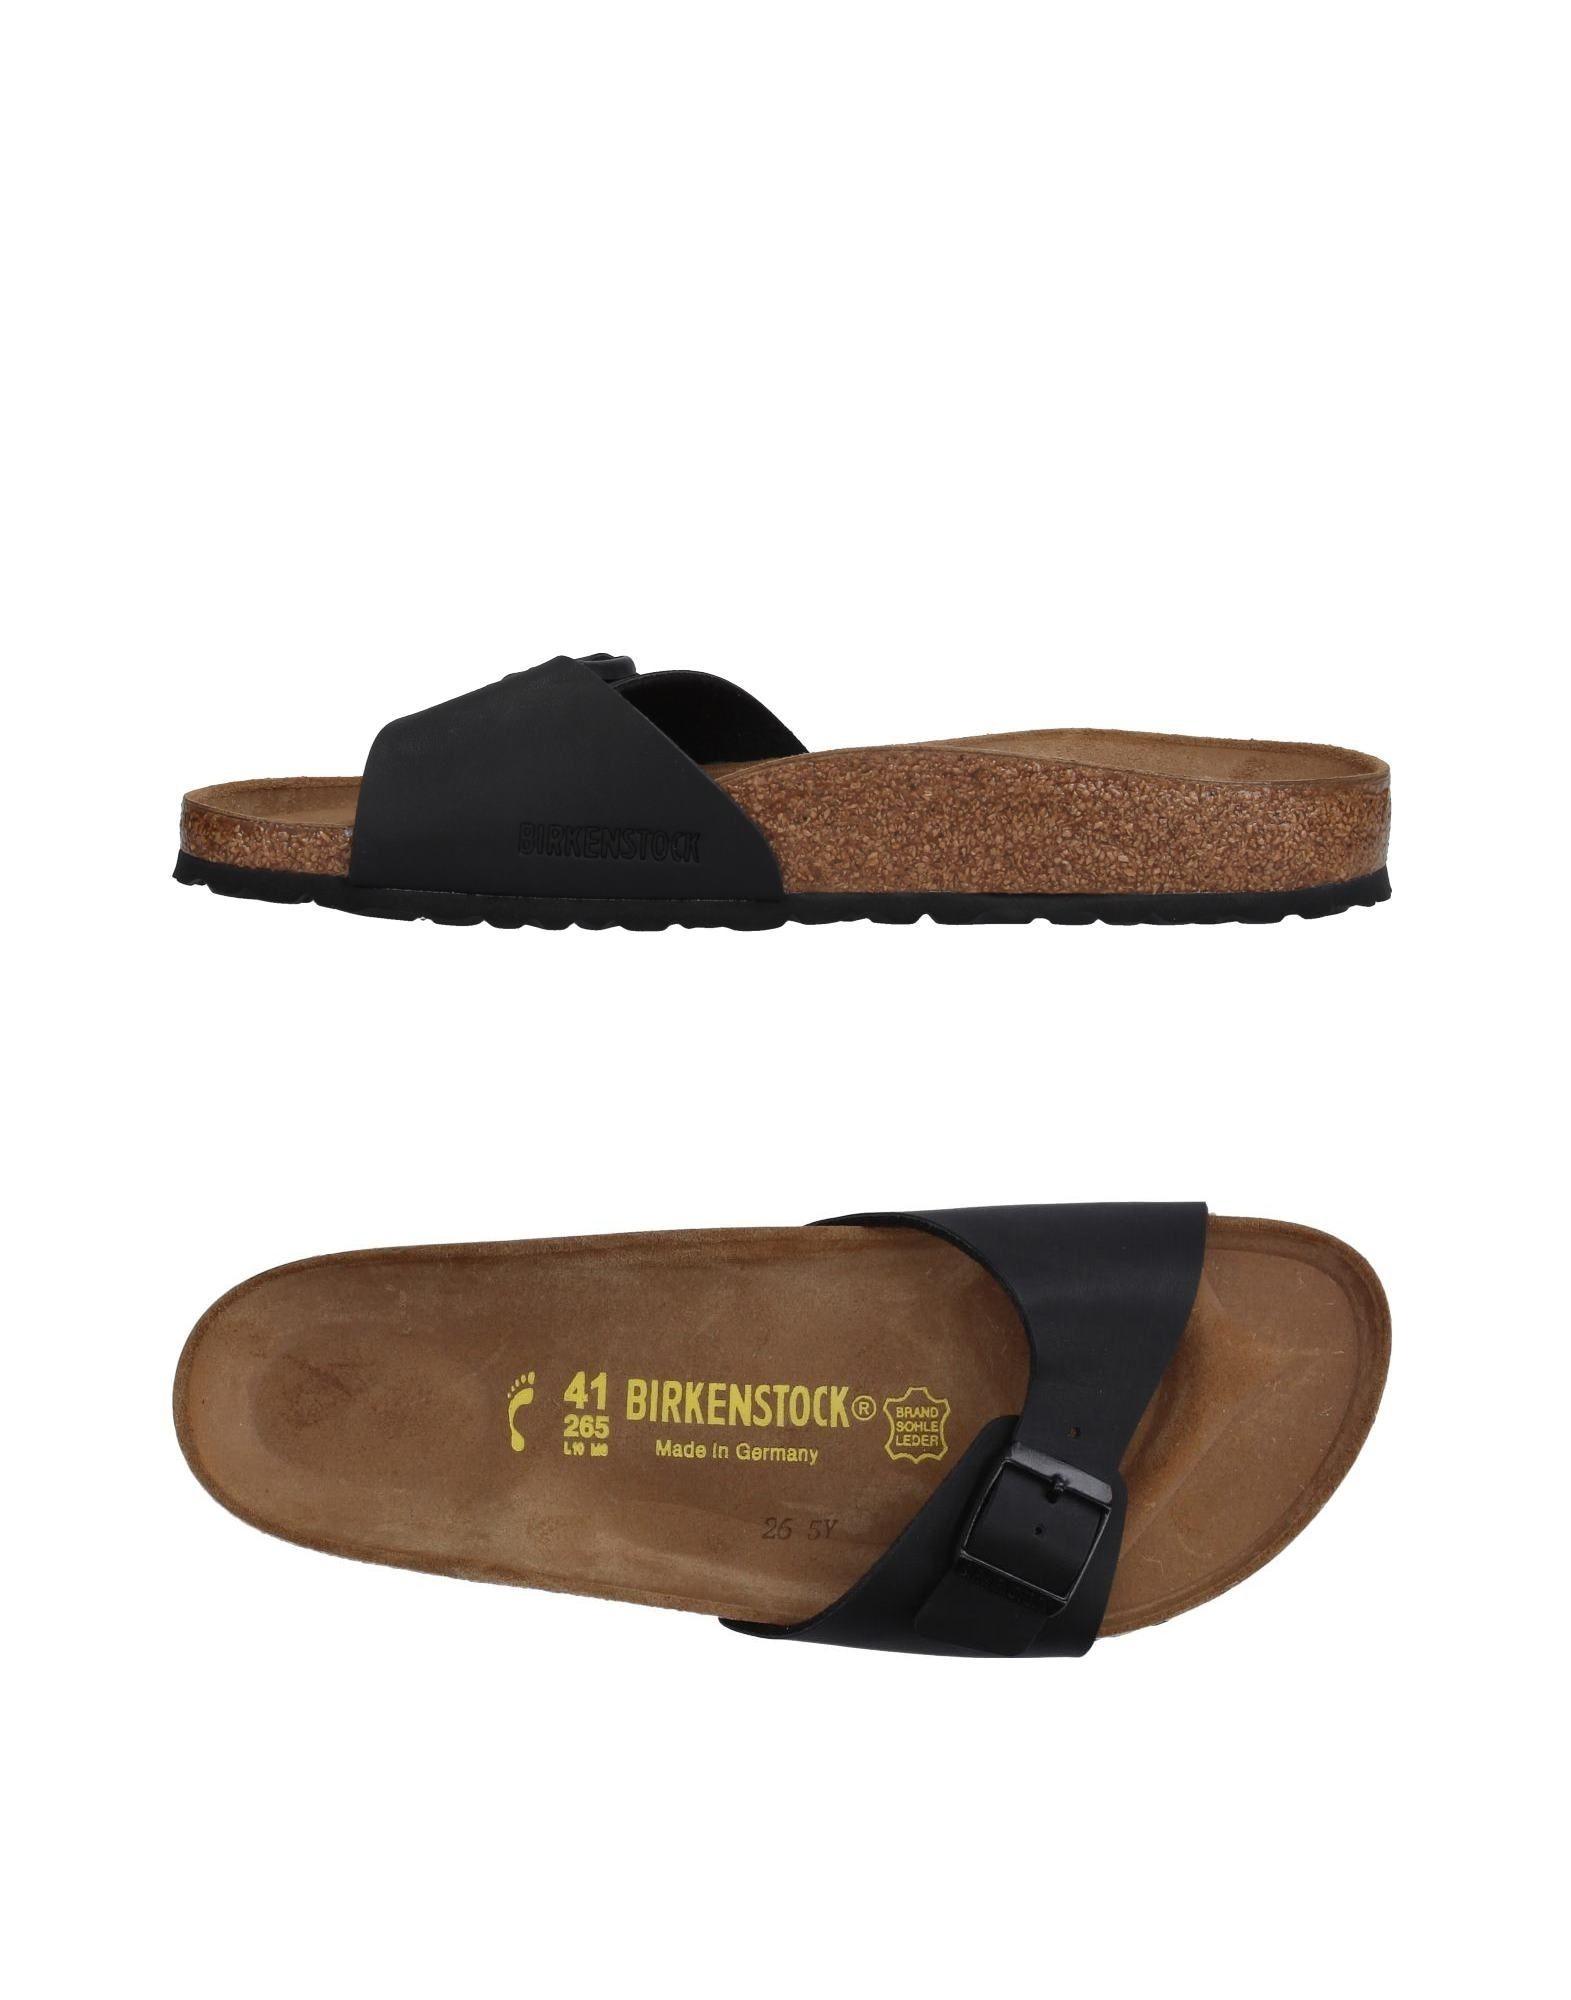 sandales tongs homme simili cuir jusqu 42 homme soldes deuxi me d marque. Black Bedroom Furniture Sets. Home Design Ideas